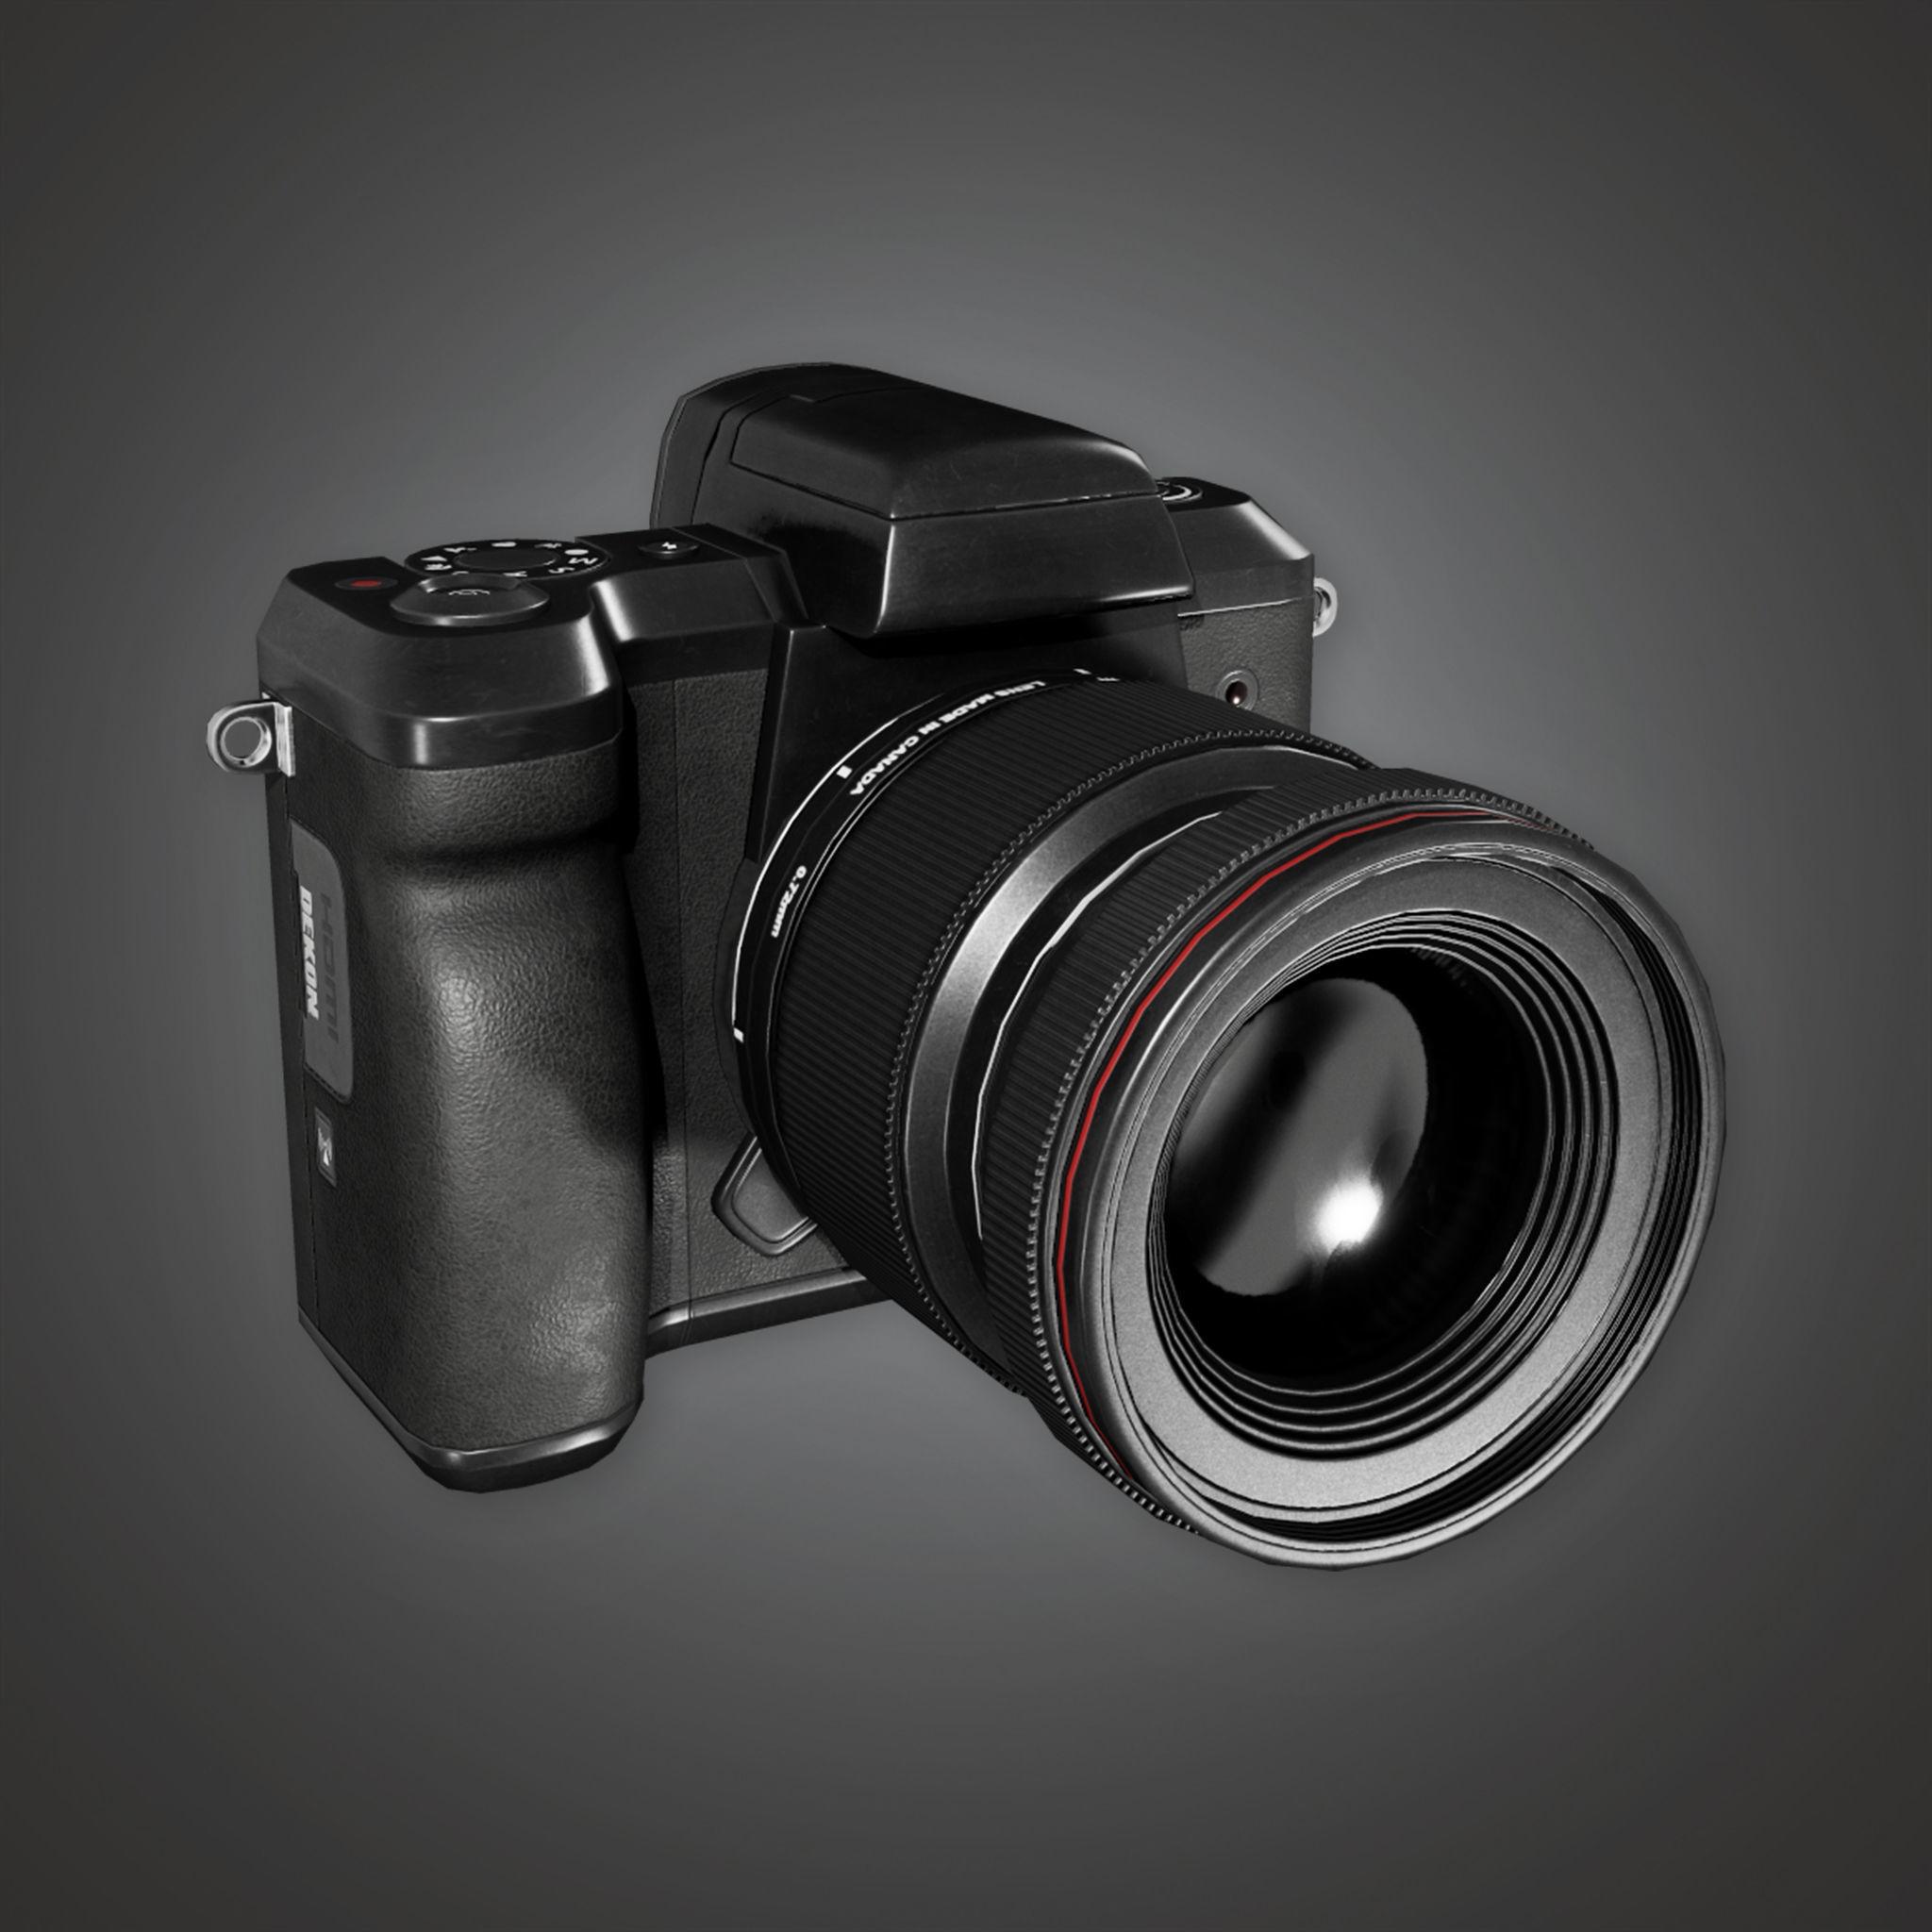 HLW - DSLR Camera - PBR Game Ready